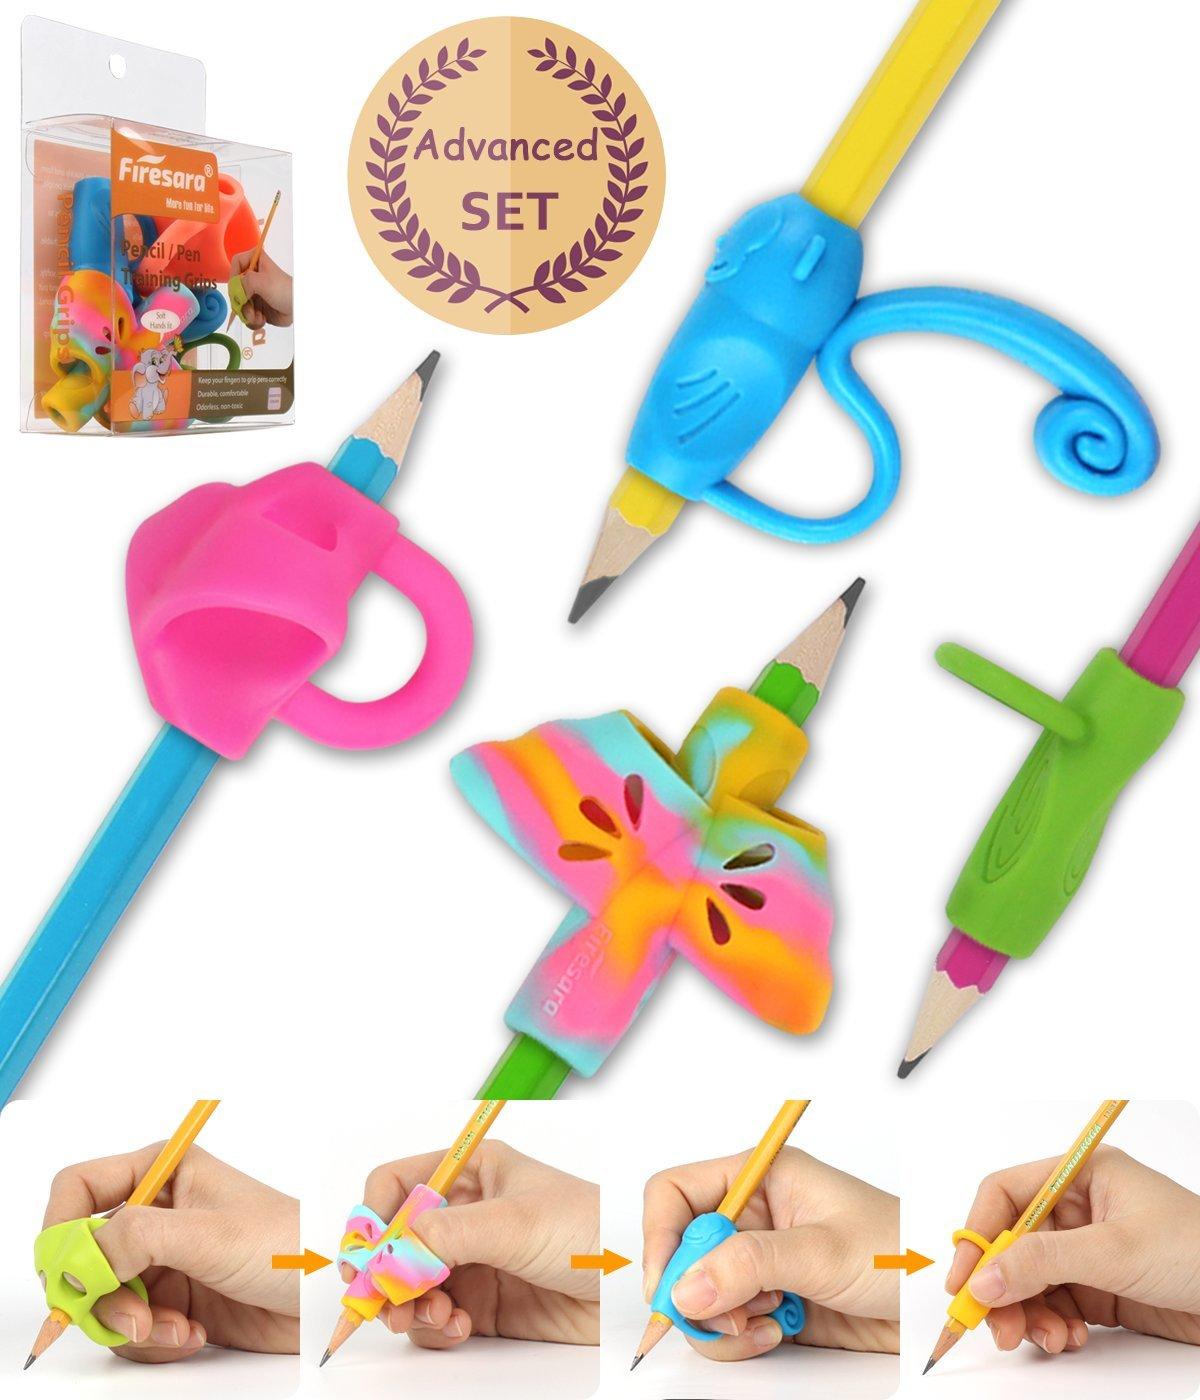 Firesara Advanced Pencil Grip Set, Original Ergonomic Handwriting AIDS Pencil Grips Writing Posture Corrector 4 Assorted Pencil Grips for Kids Children Adults Special Needs Rights